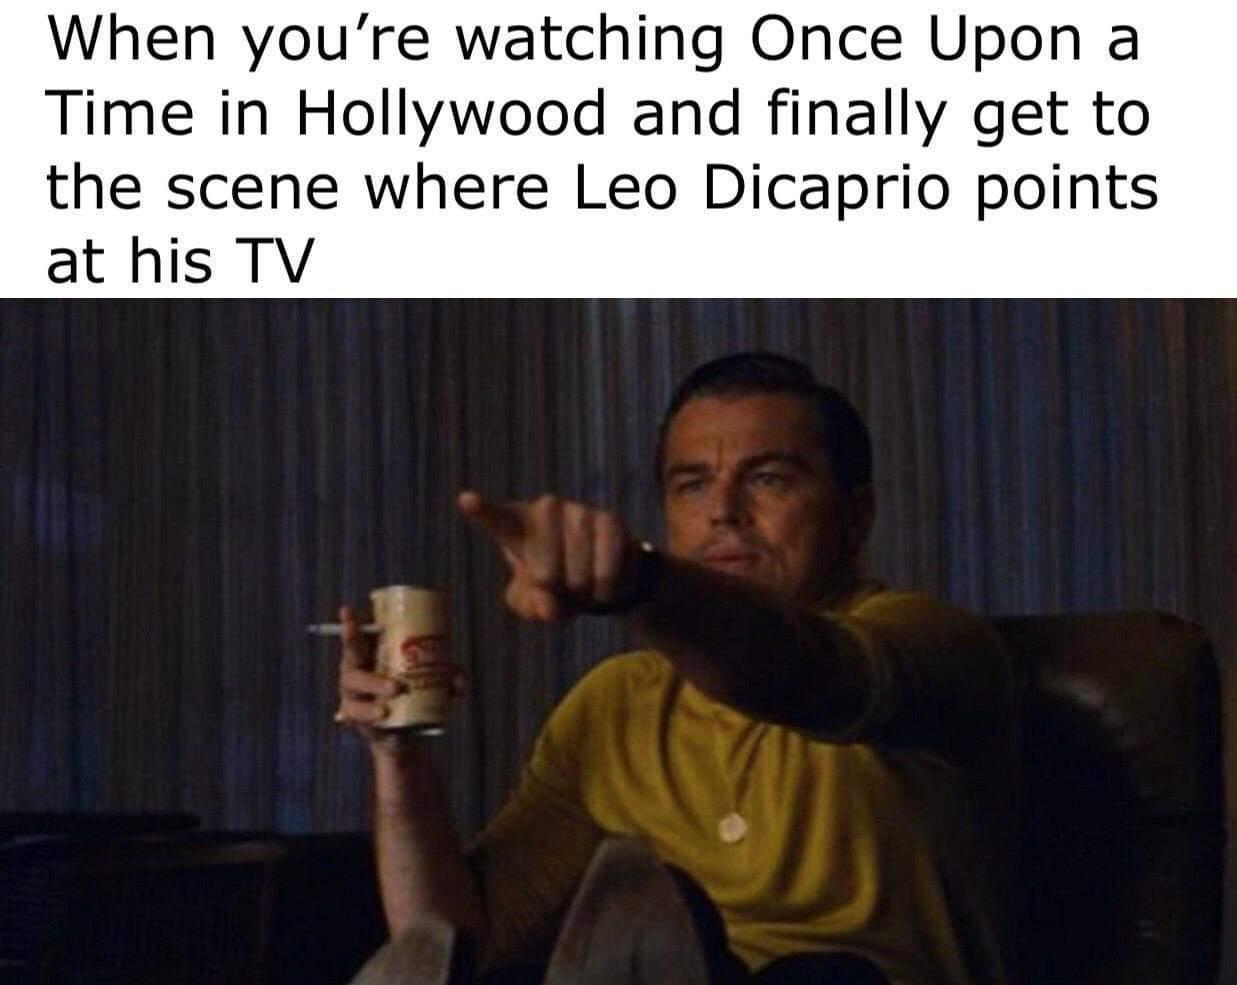 Imma gonna watch it again.... - meme